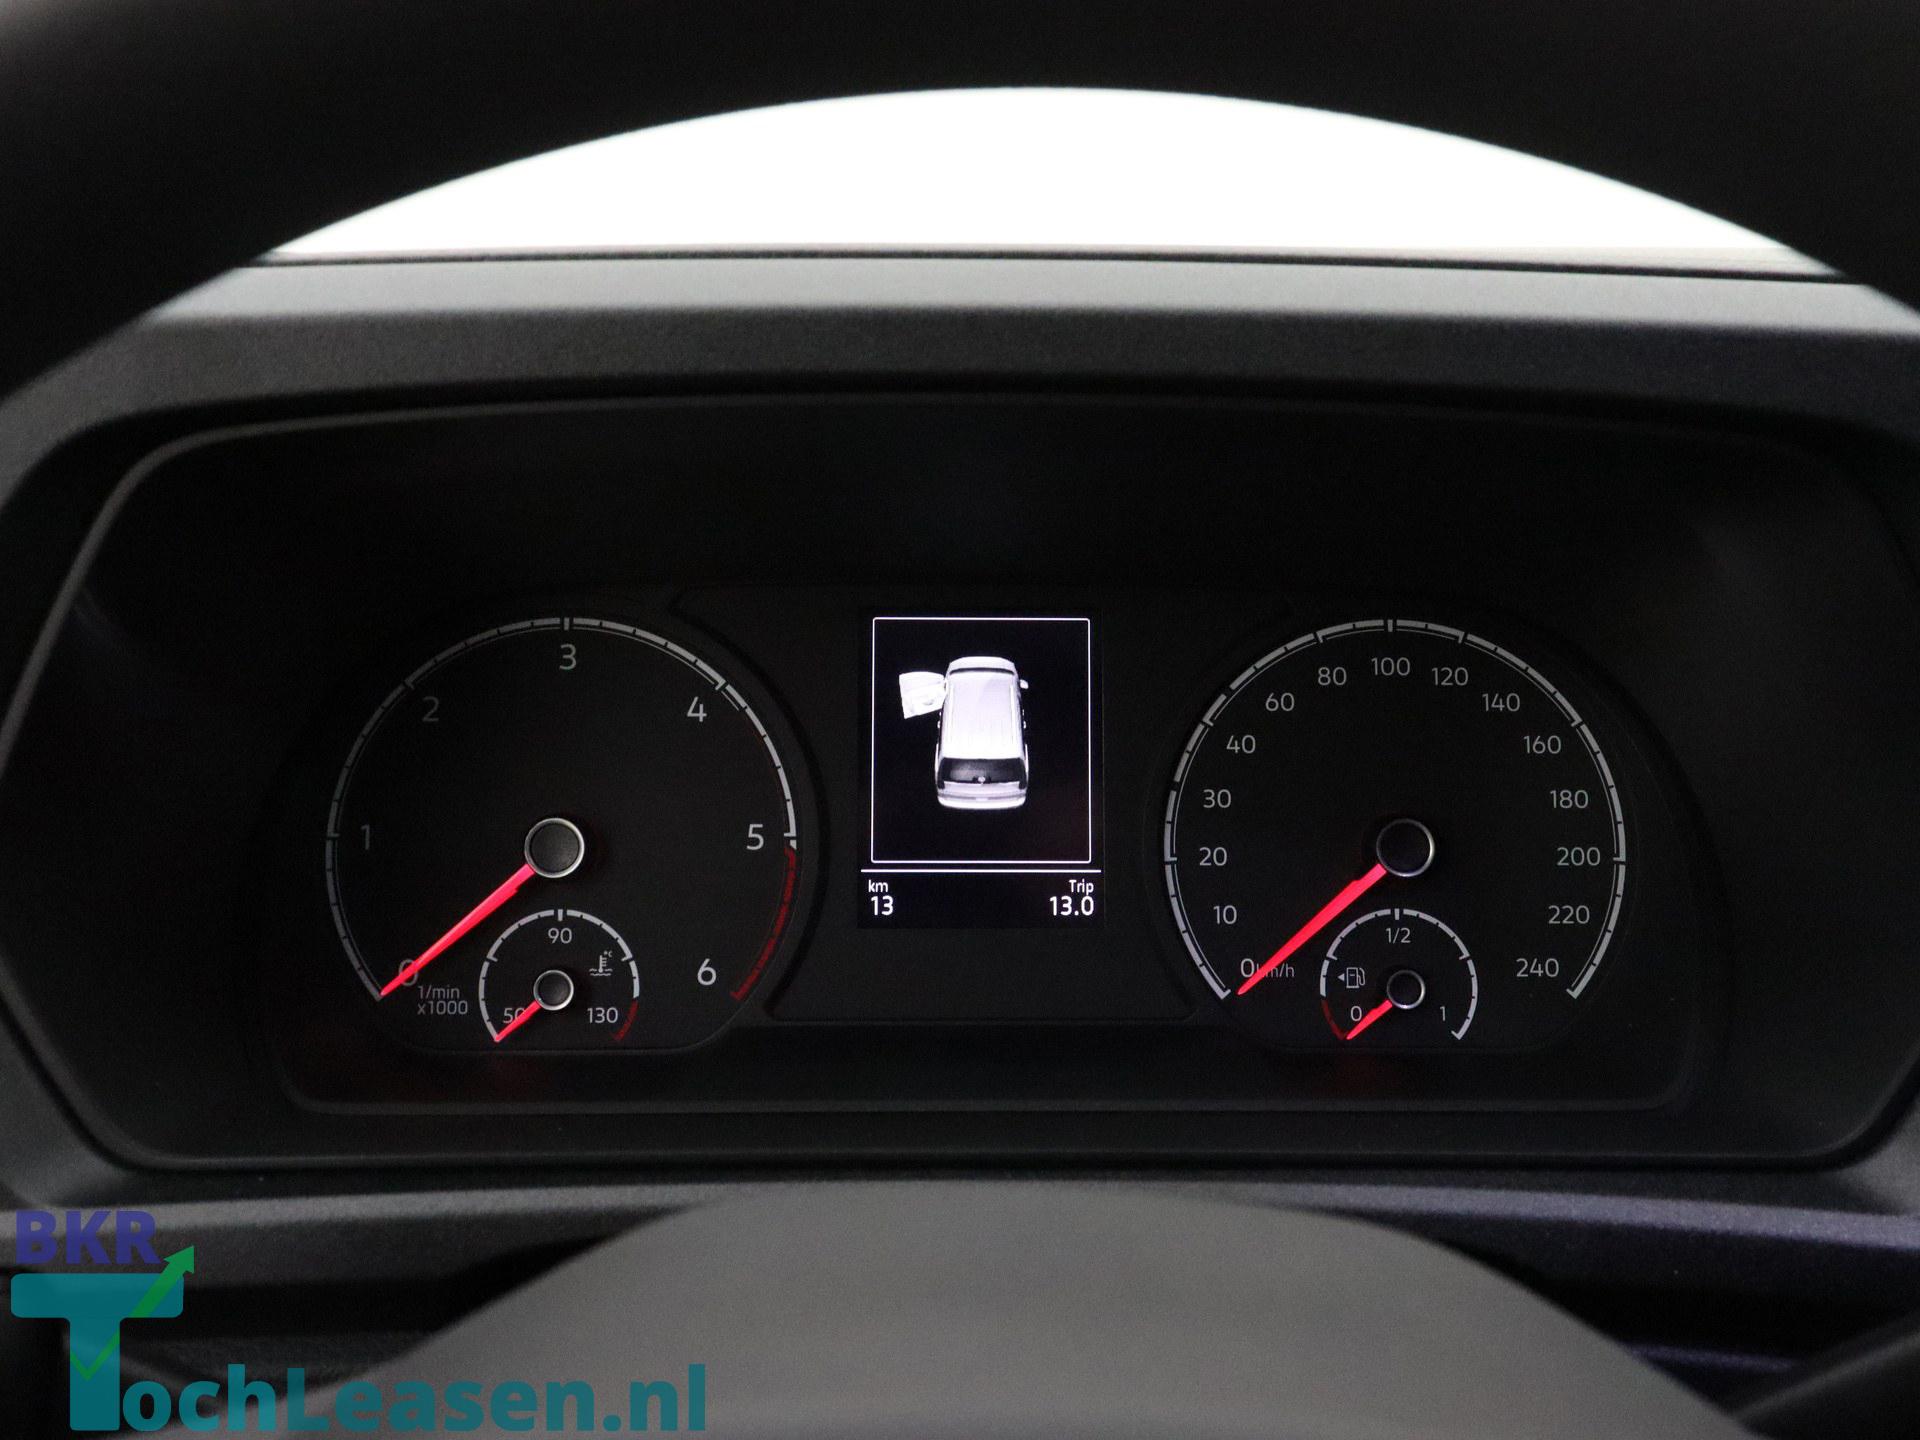 BKR toch leasen - Volkswagen Caddy - Grijs 21